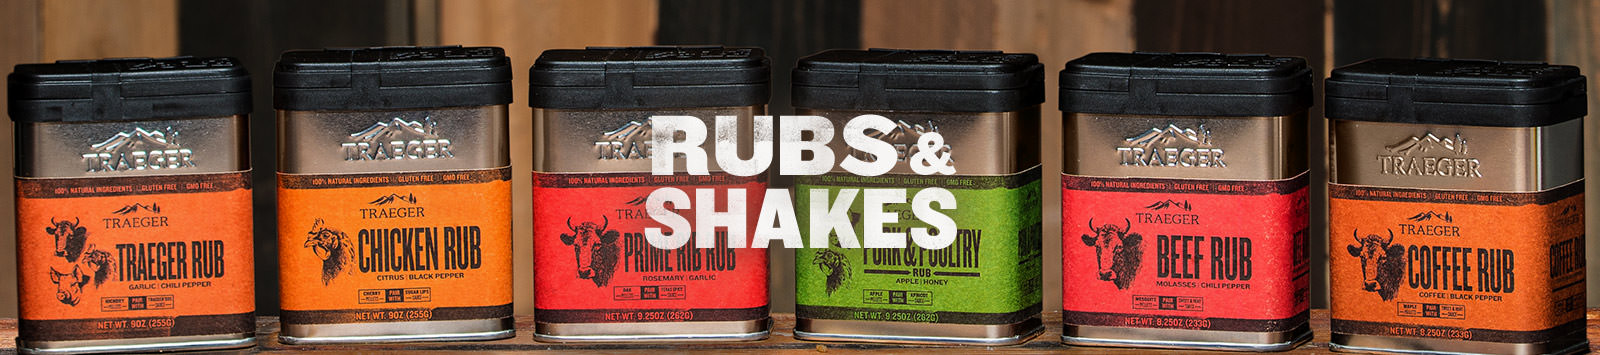 Rubs and Shakes